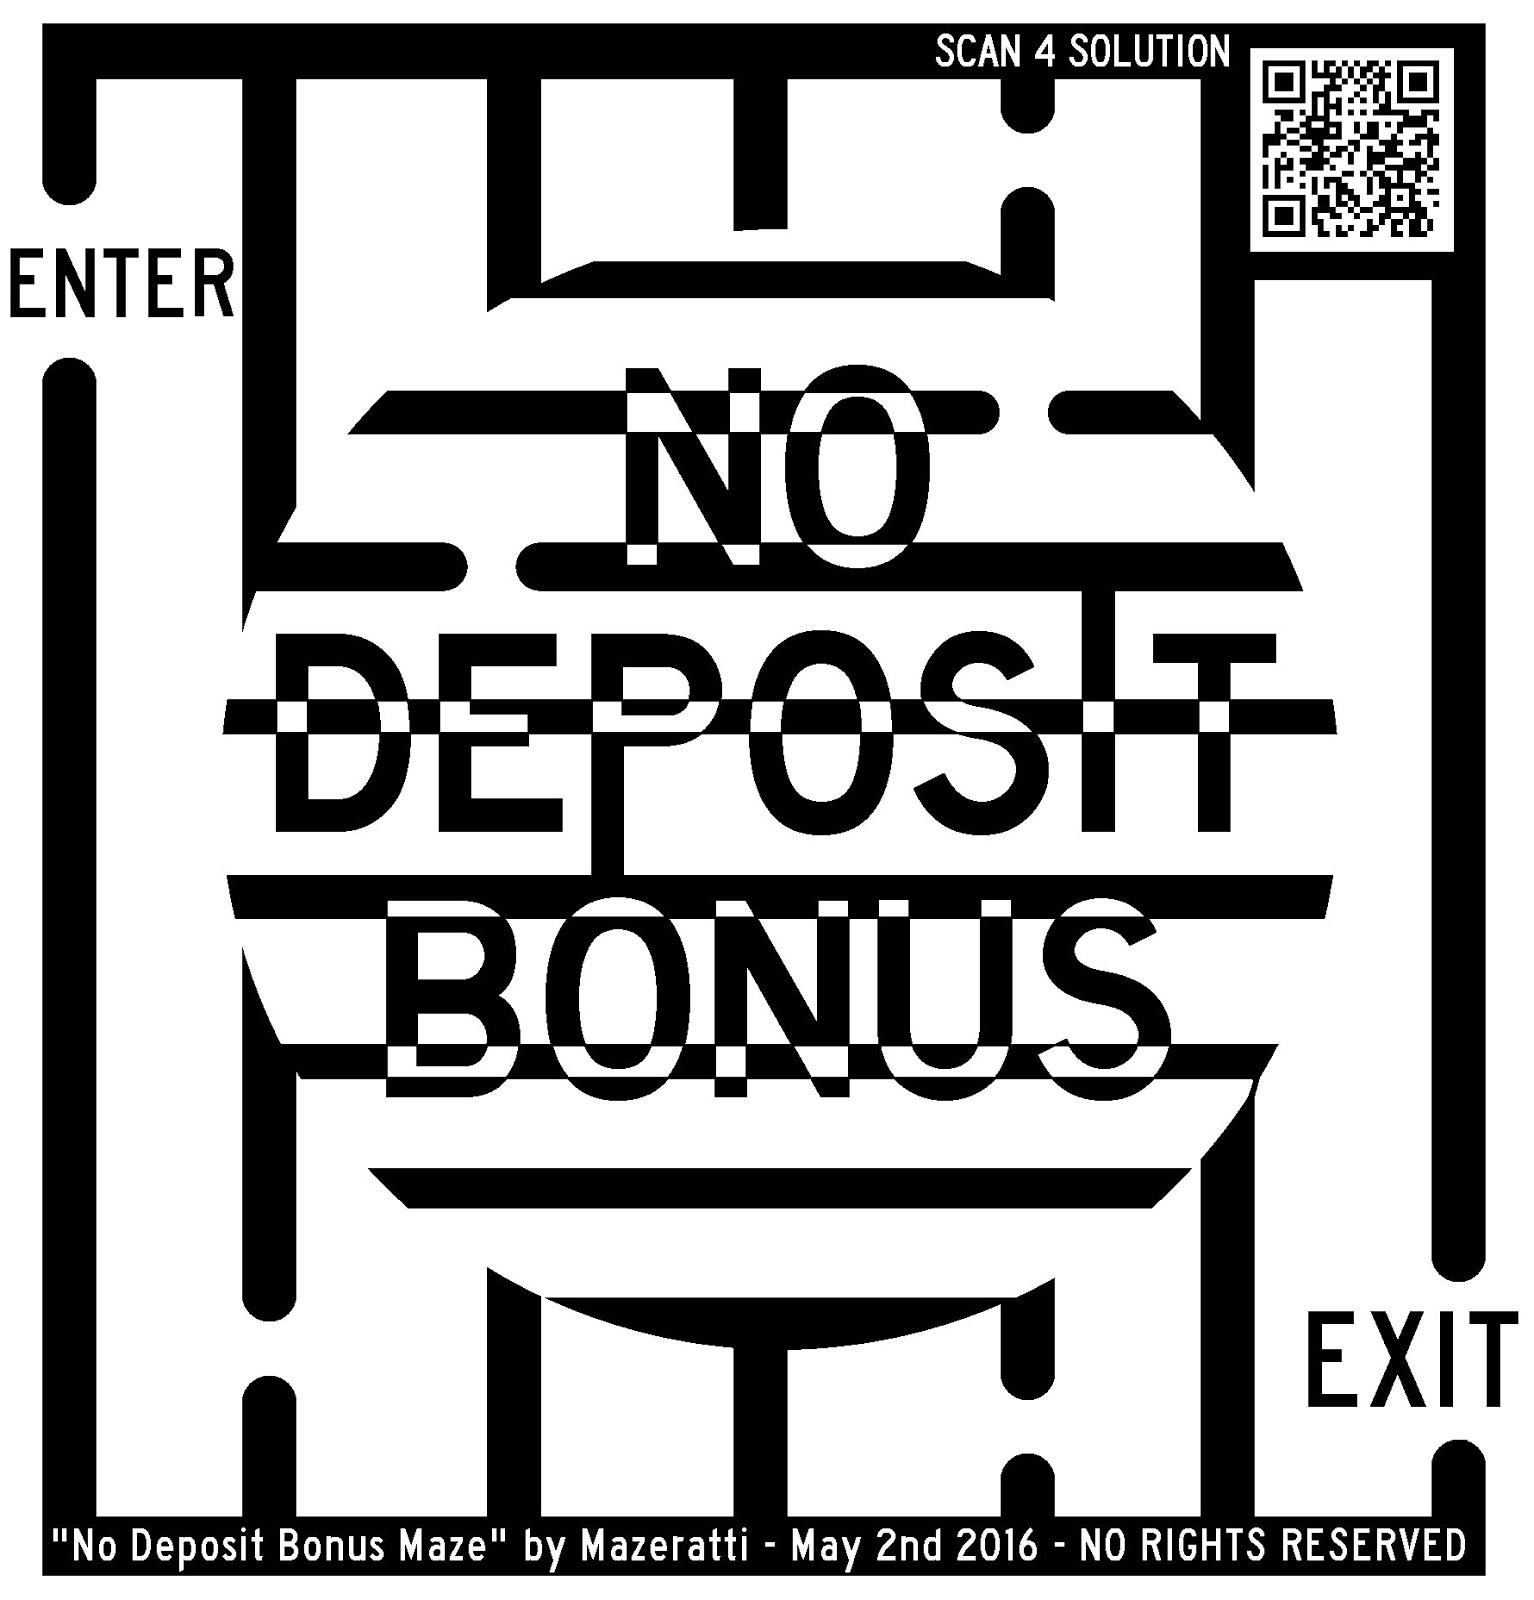 casino online free bonus no deposit